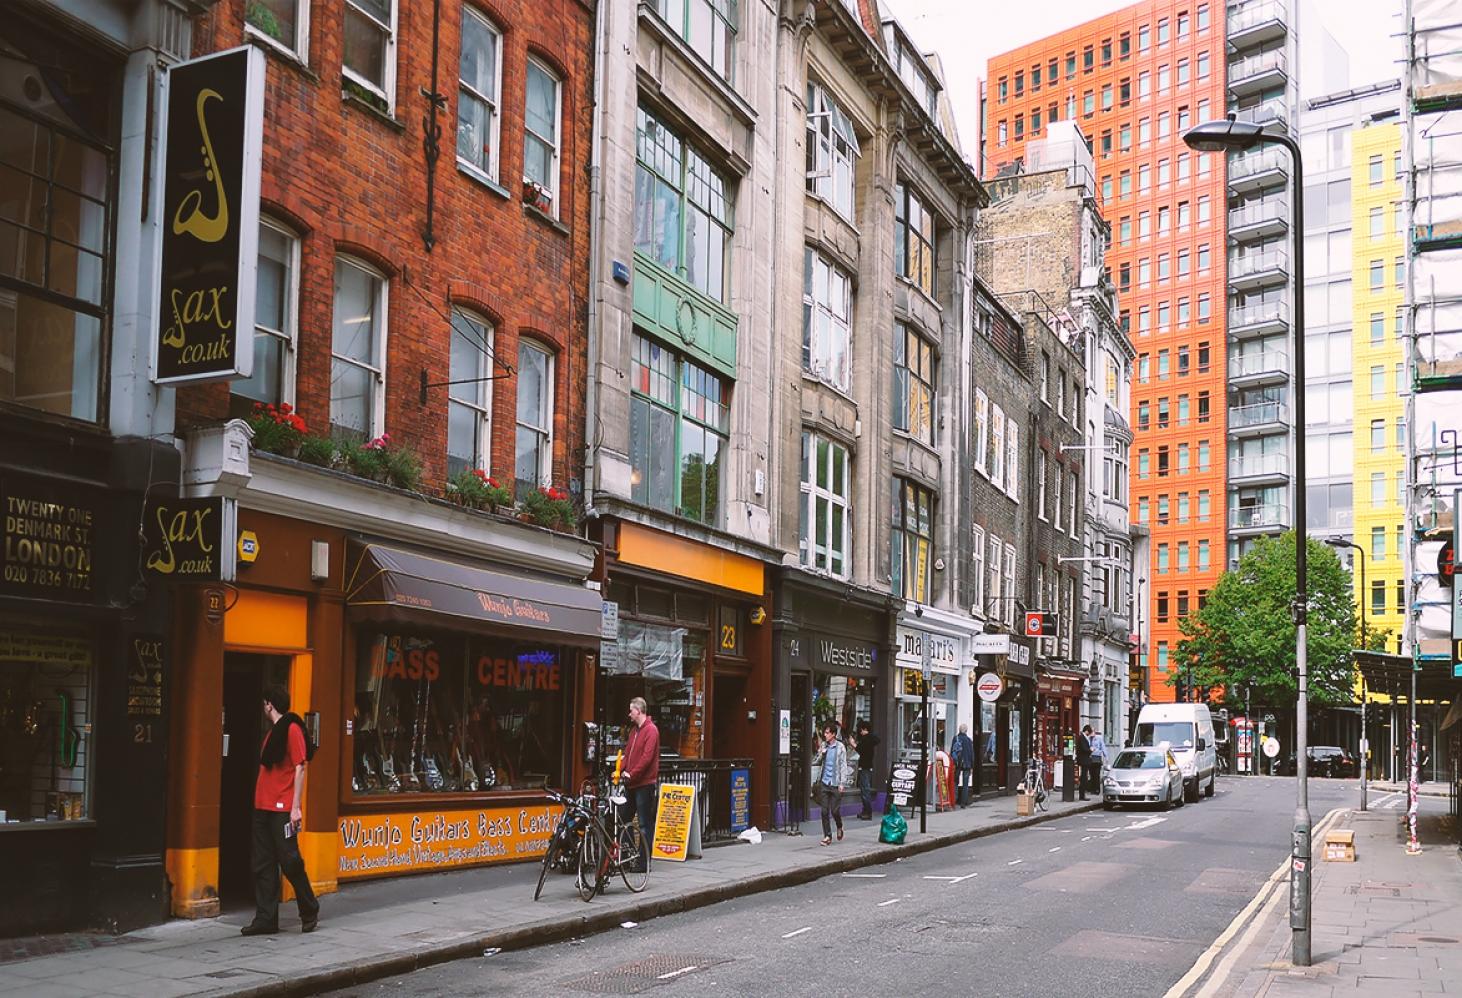 Денмарк-Стрит, Лондон